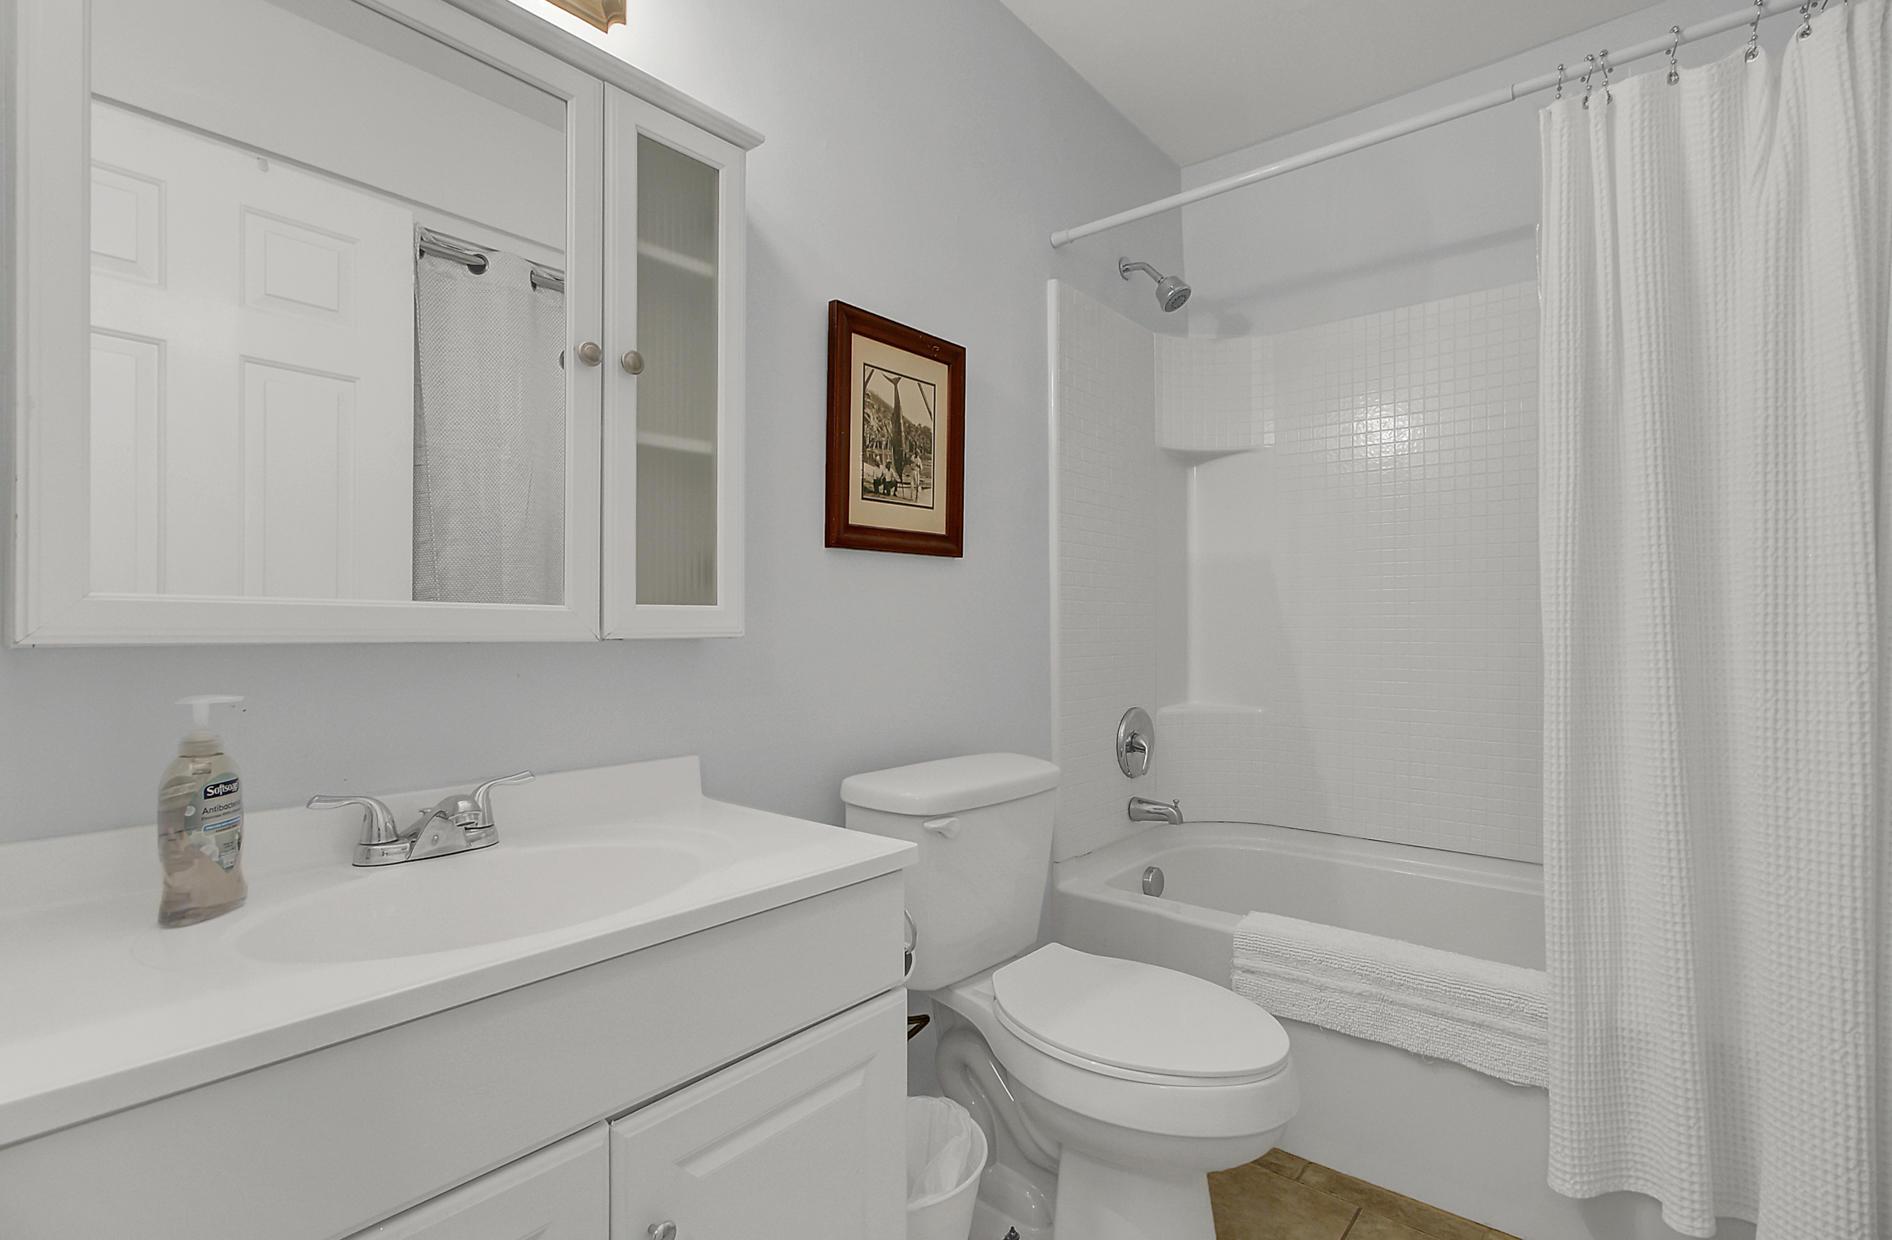 Riverland Place Homes For Sale - 234 Stefan, Charleston, SC - 5